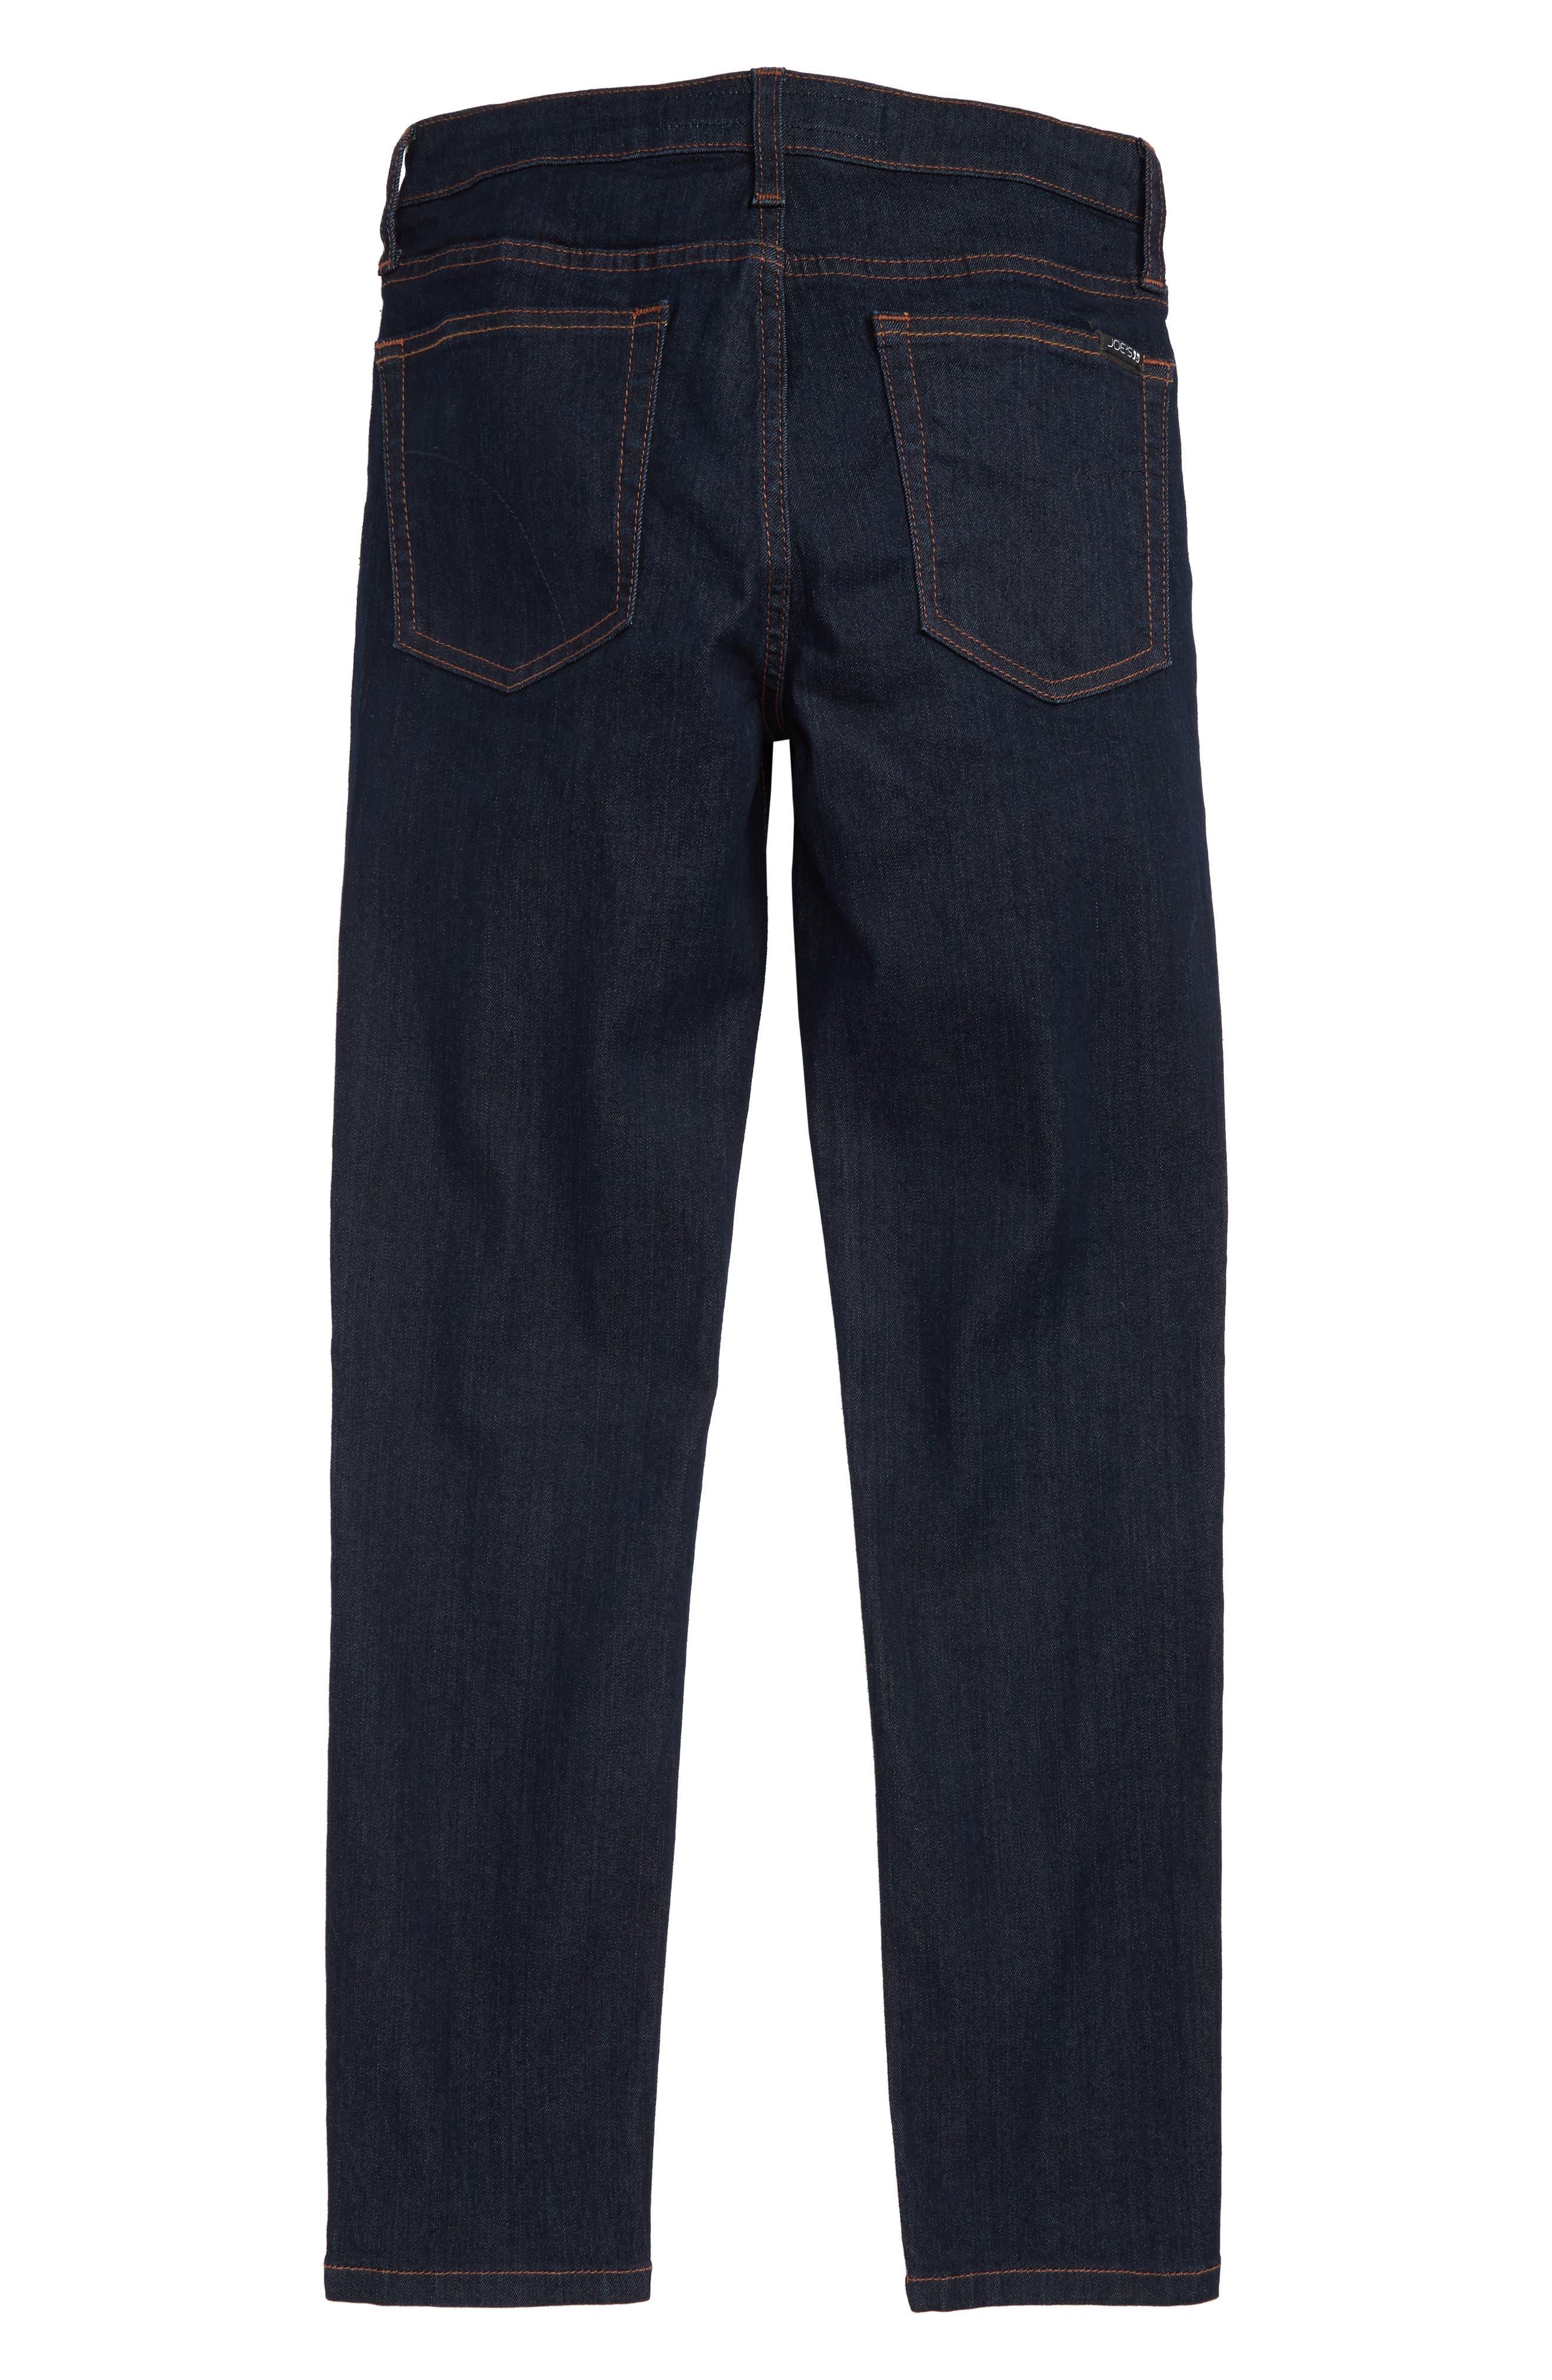 Brixton Stretch Jeans,                             Alternate thumbnail 5, color,                             DRESDEN BLUE